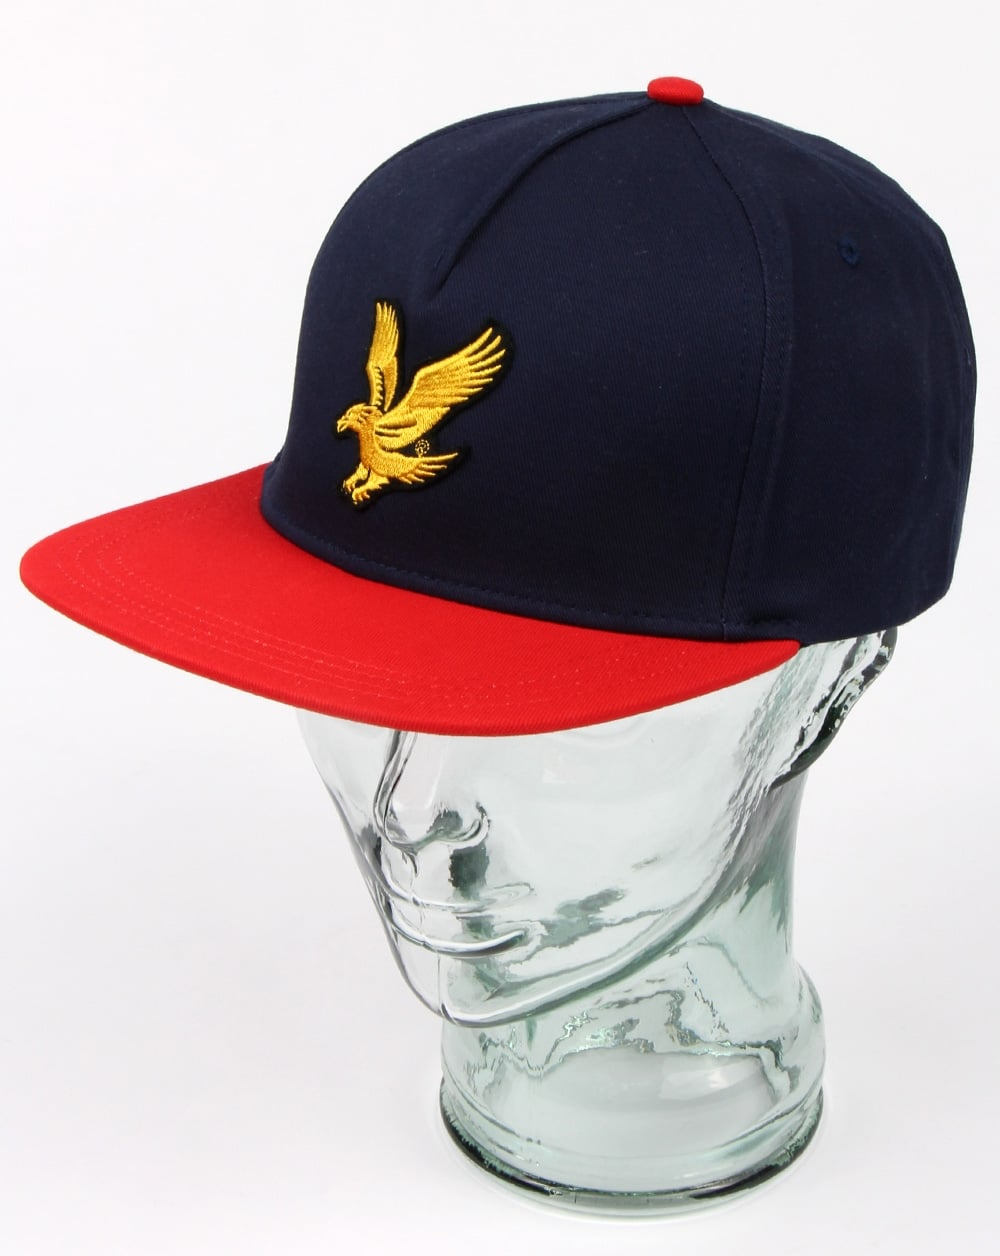 Lyle /& Scott Baseball Cap RED